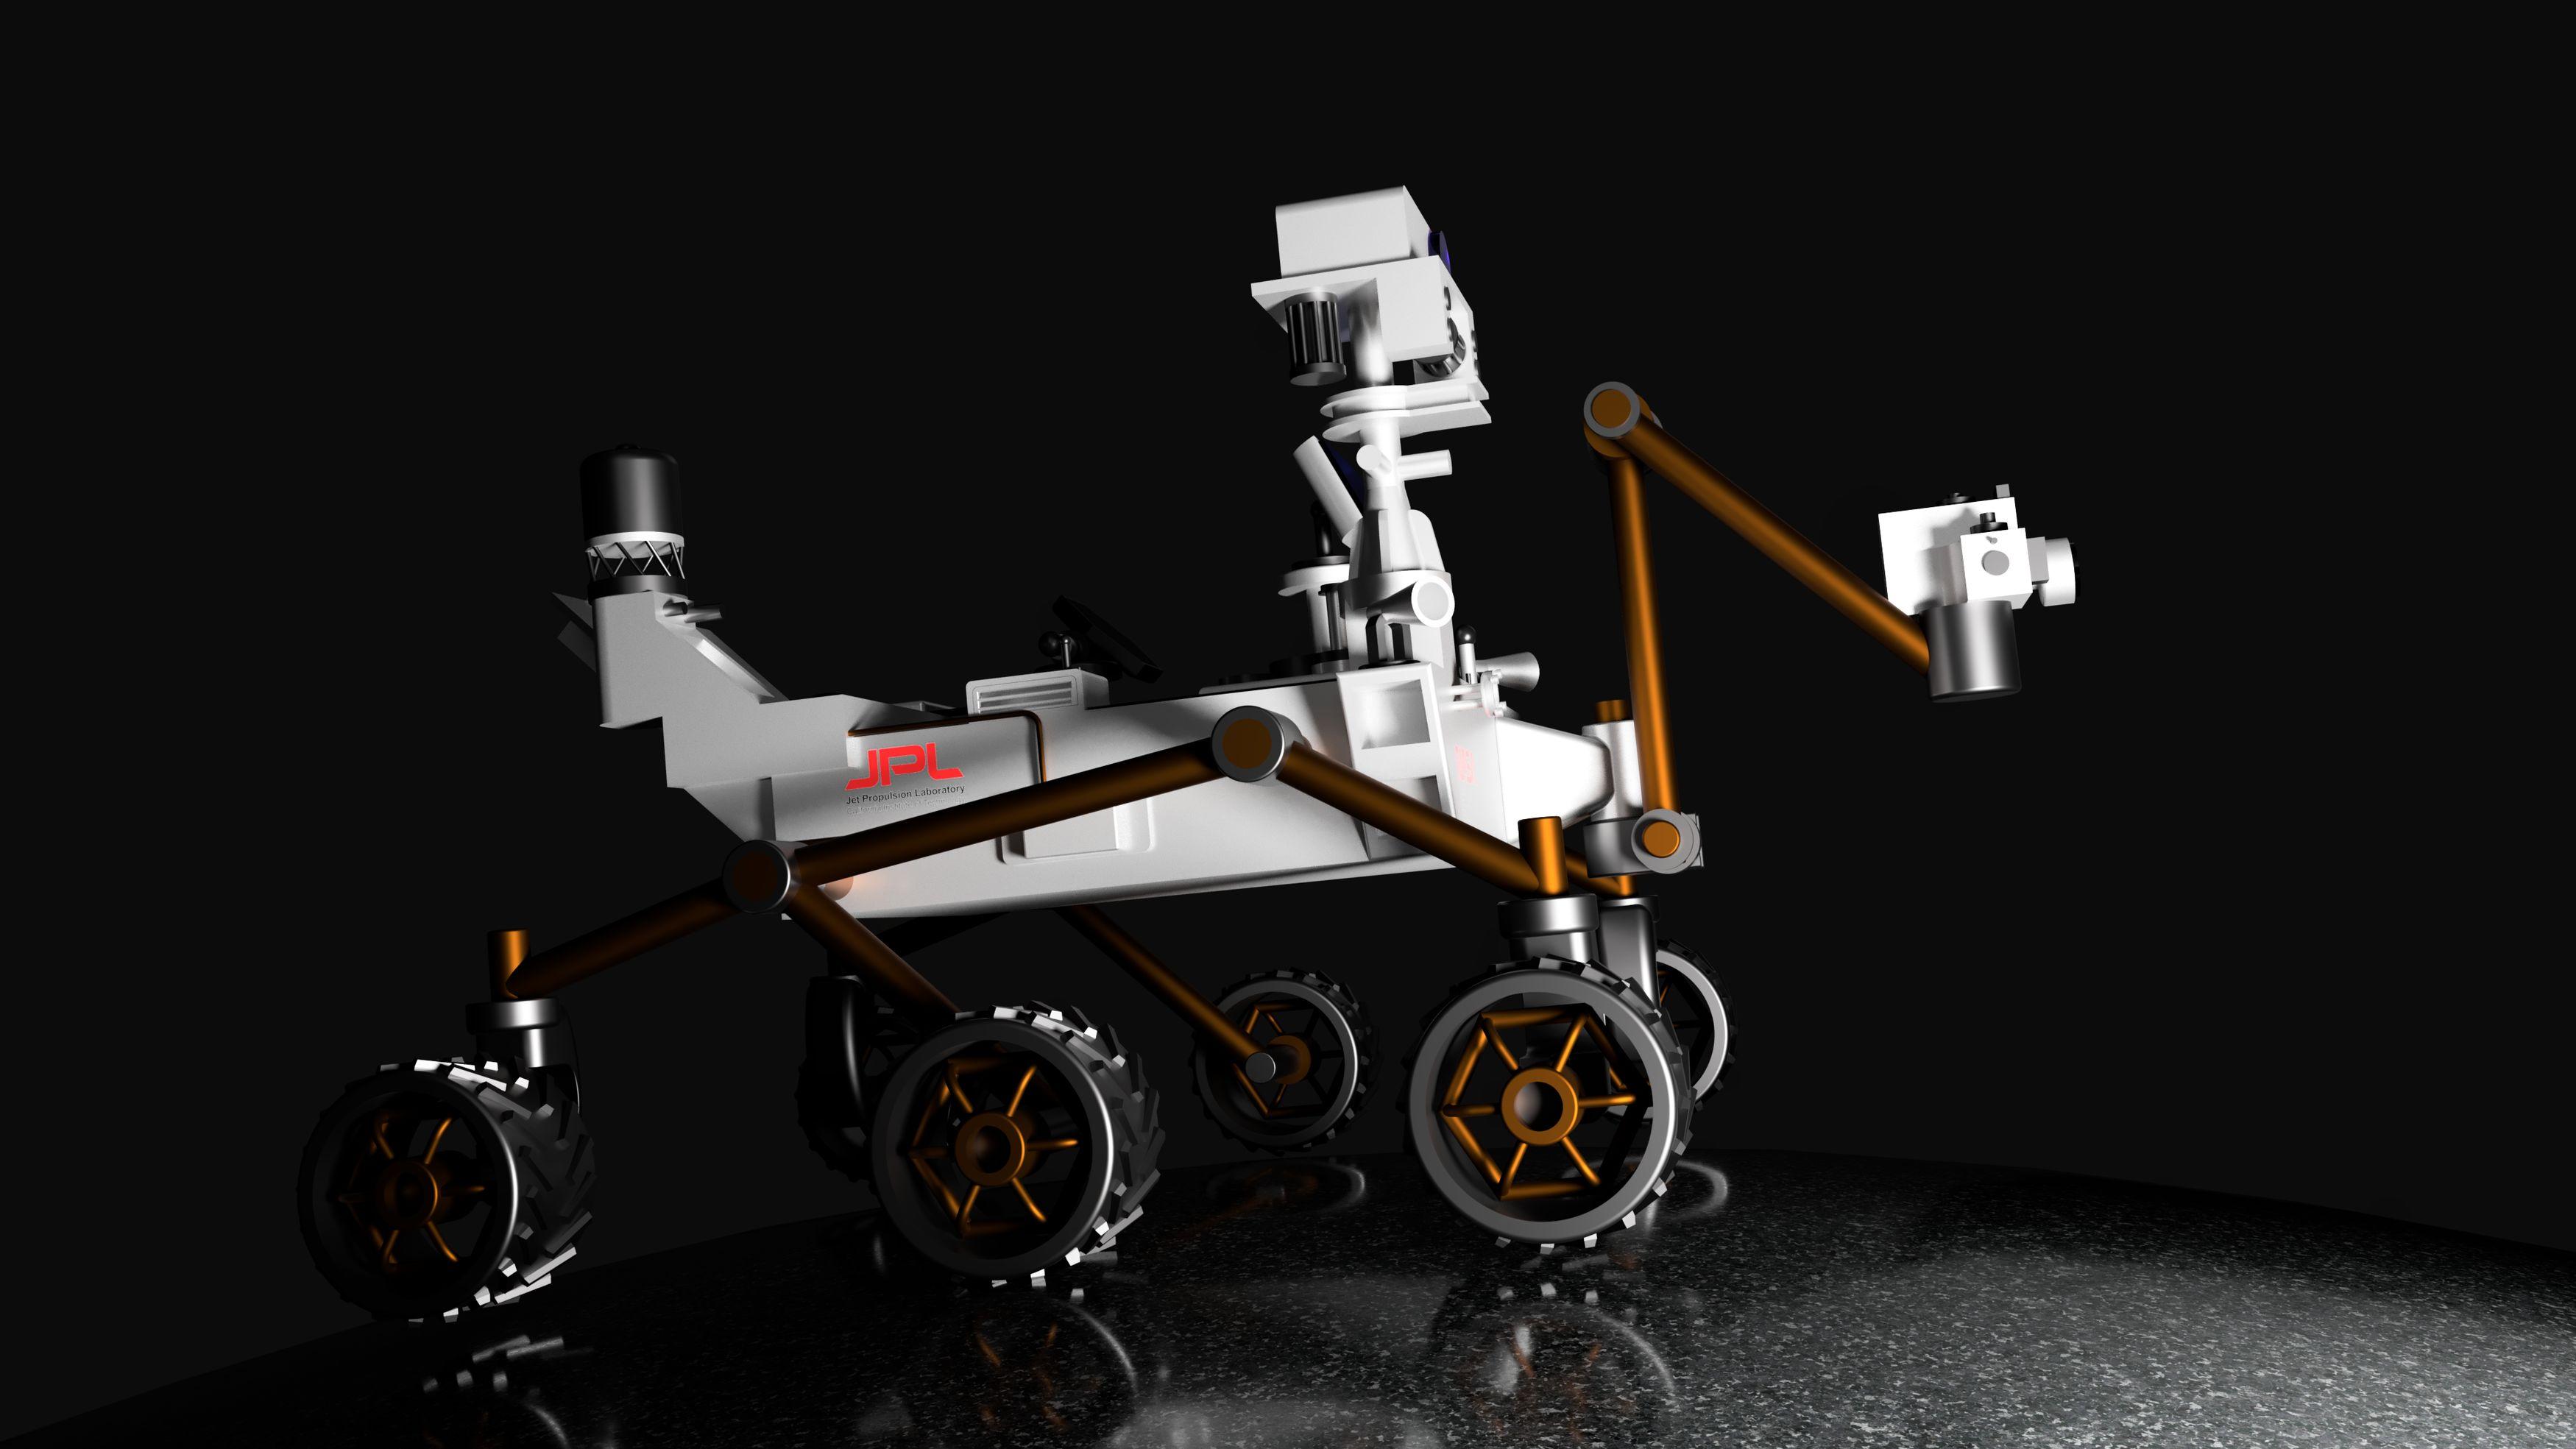 Robot-space-nasa---lcs2020-2020-may-06-10-50-18pm-000-customizedview4072087455-png-3500-3500